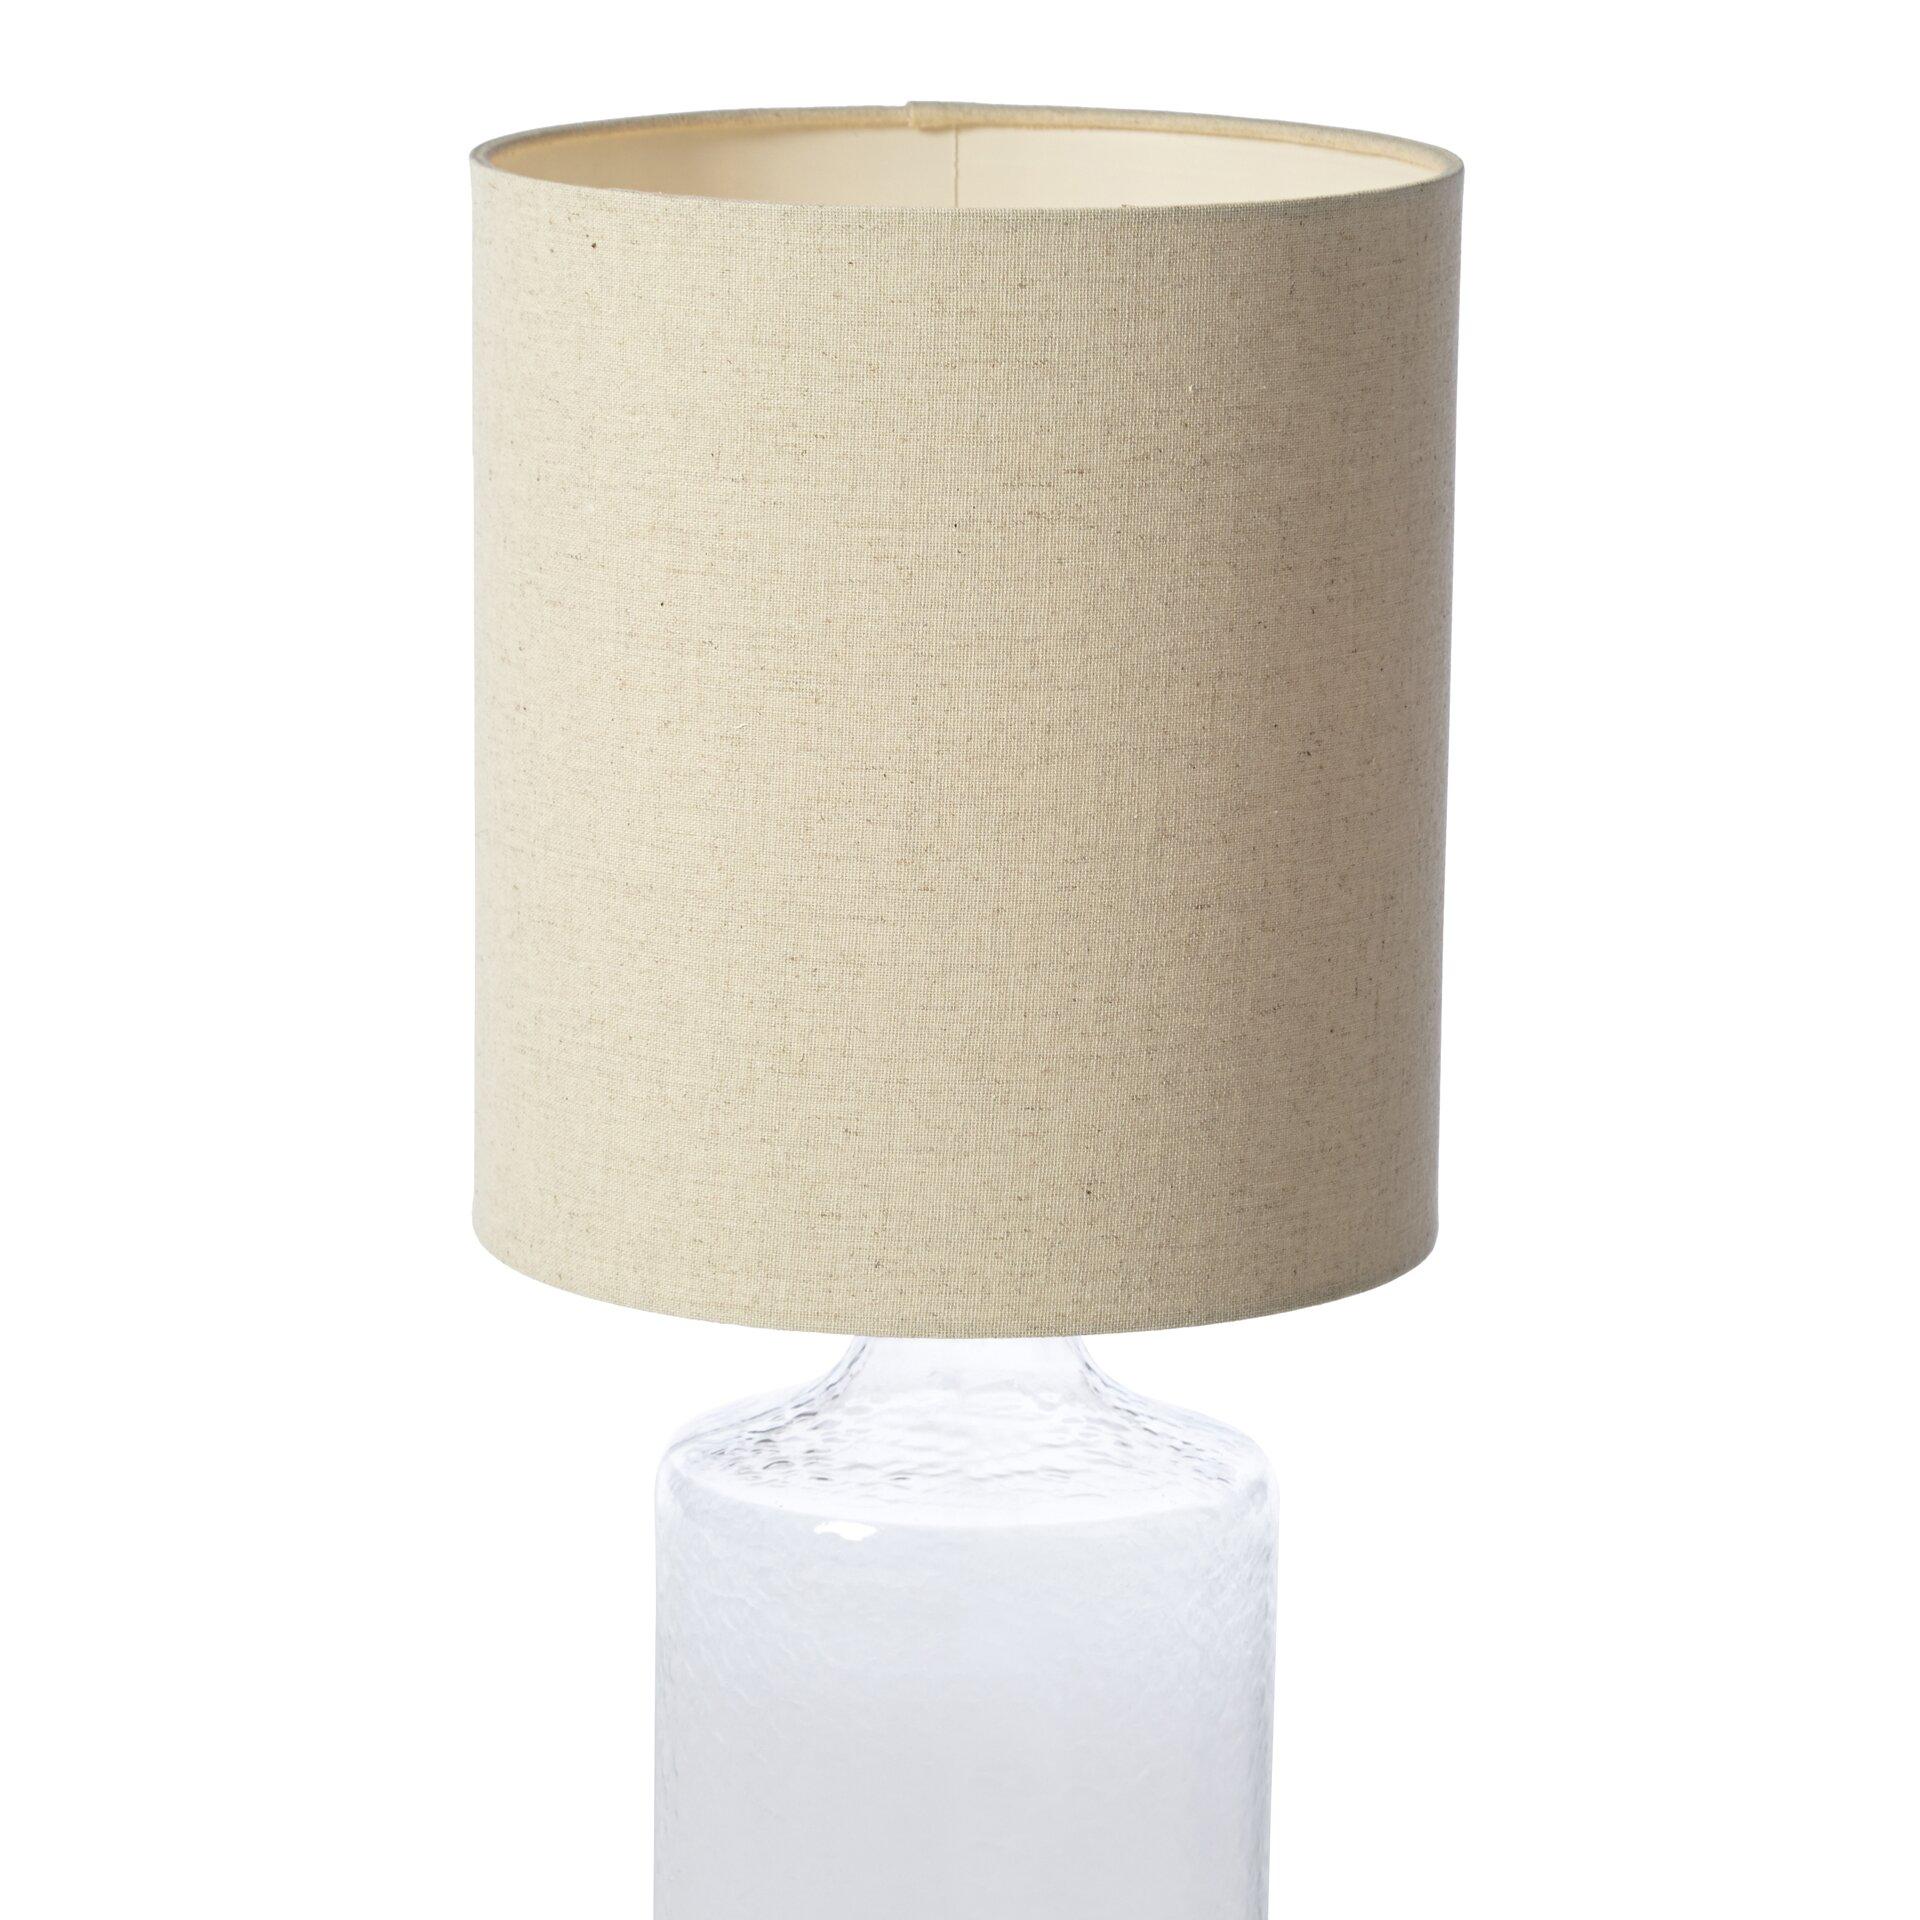 Zipcode Design Malibu 215quot Table Lamp amp Reviews Wayfair : Seeded2BGlass2B21525222BTable2BLamp2Bwith2BDrum2BShade from www.wayfair.com size 1920 x 1920 jpeg 435kB